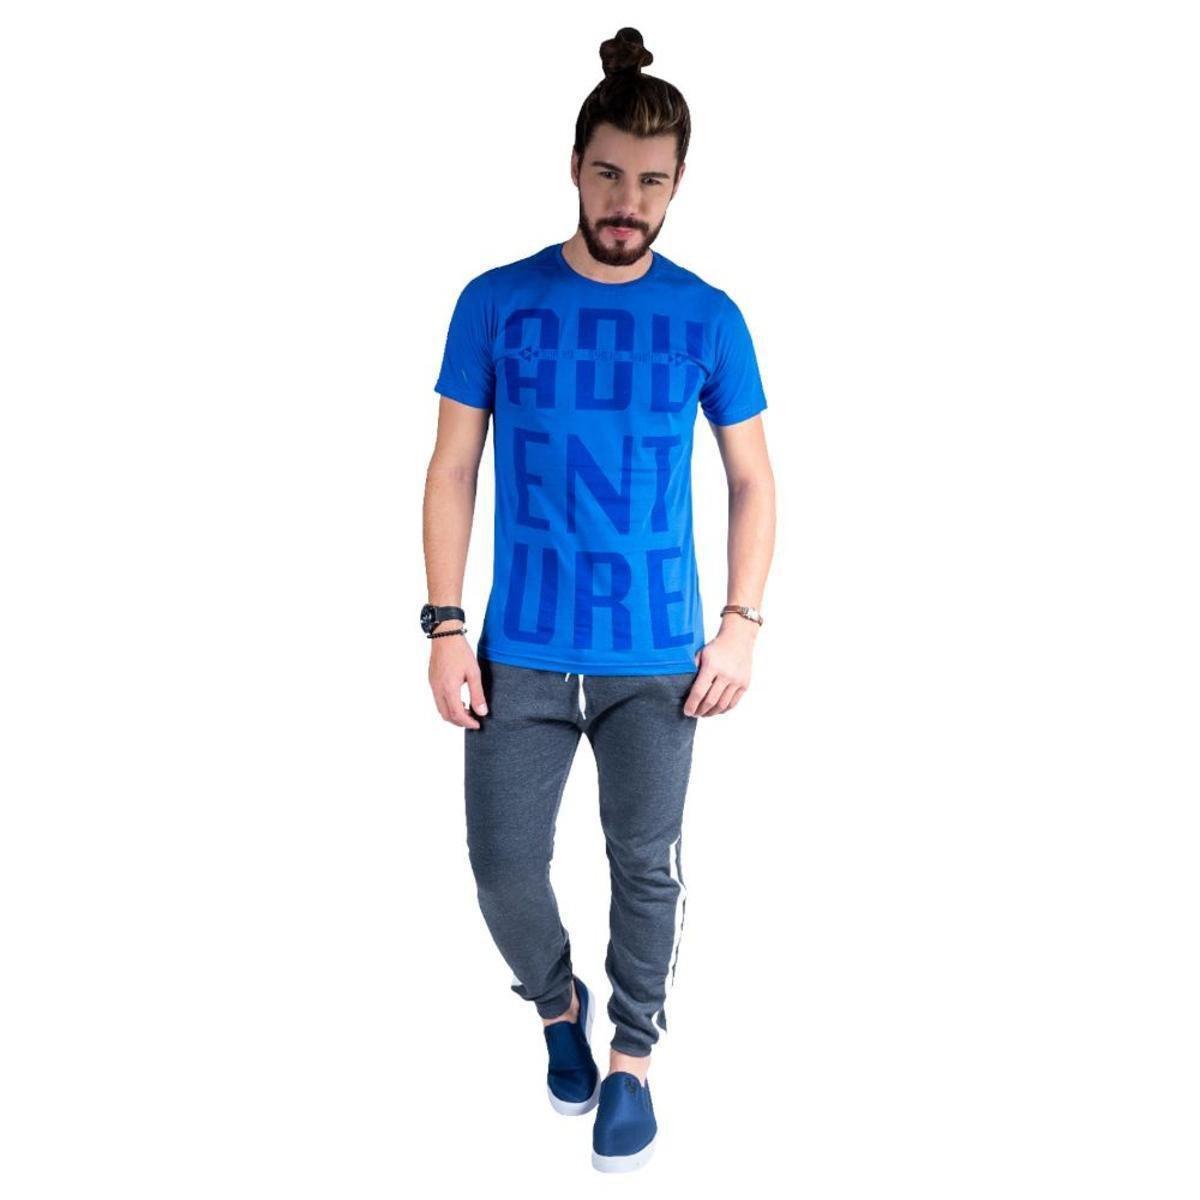 Camiseta Mister Fish Estampado Adventure Masculina - Azul Royal 8cNKC